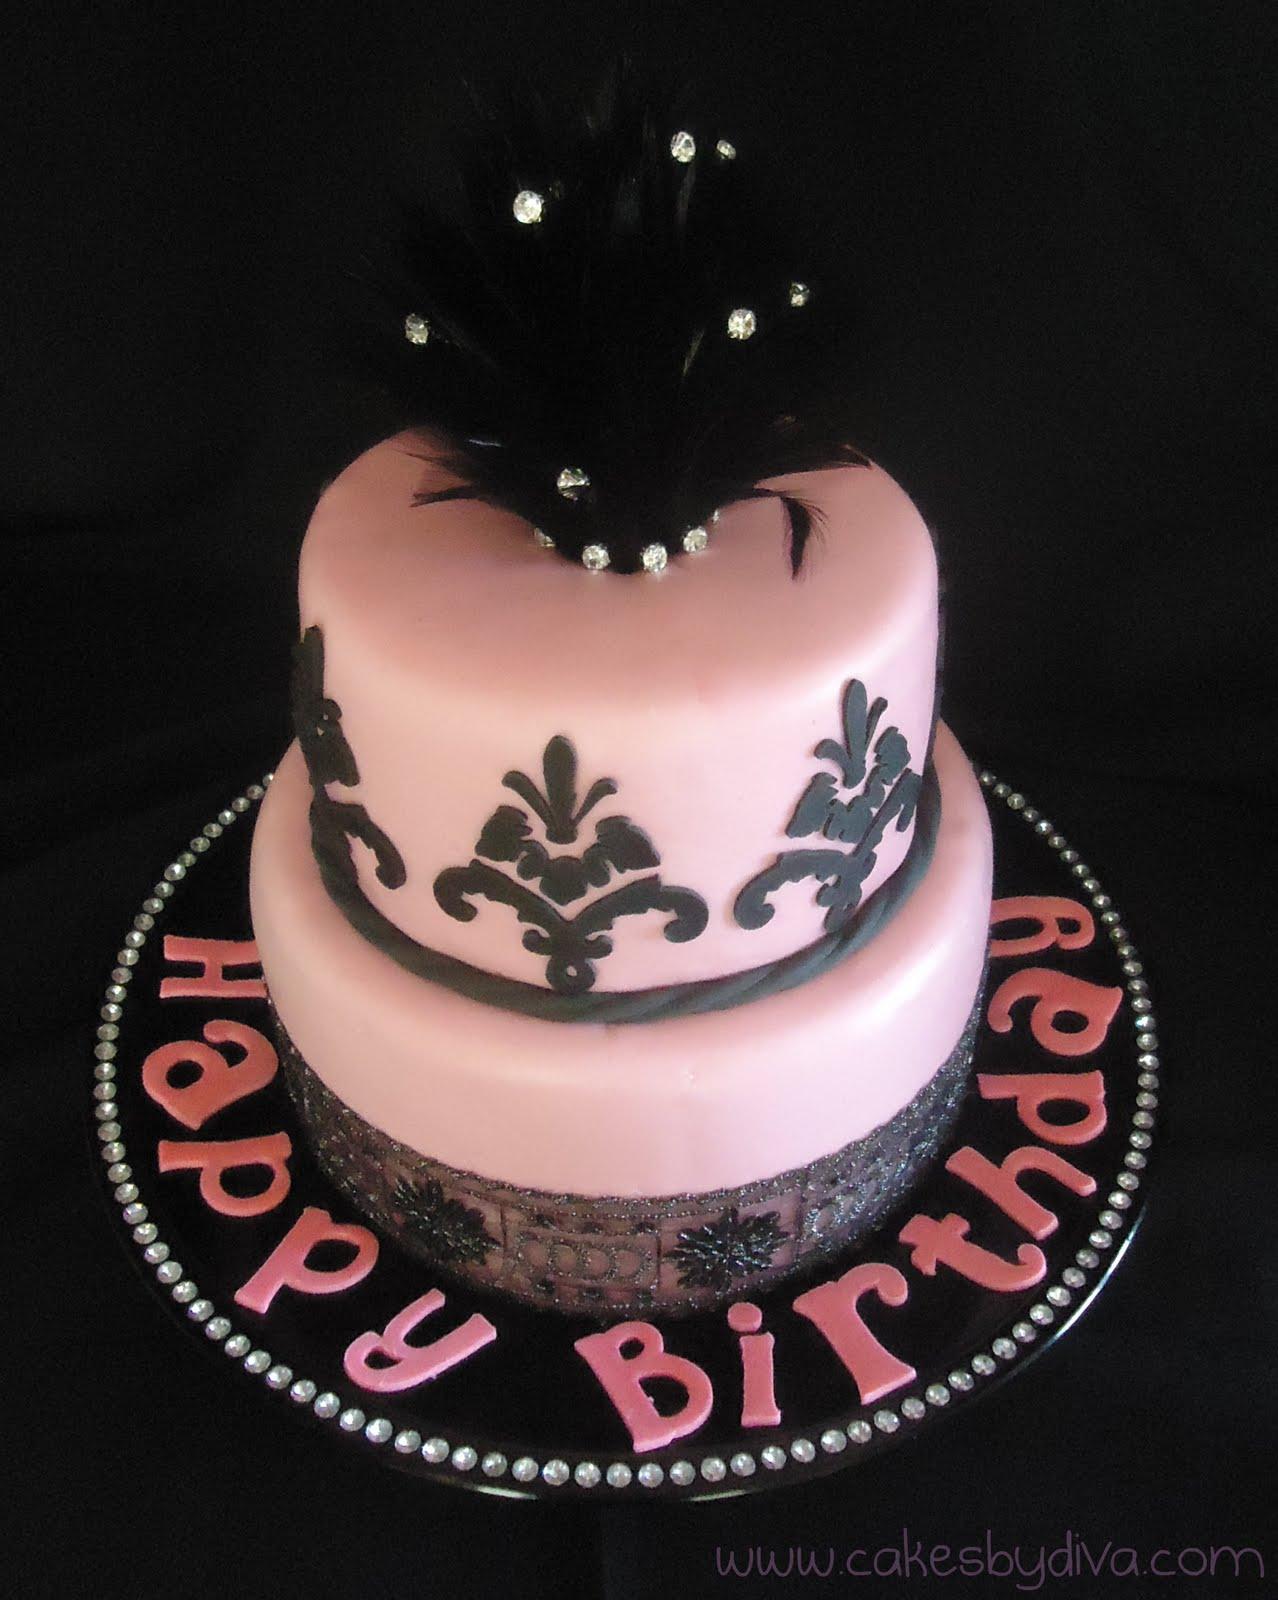 Cakes By Diva Ooh La La